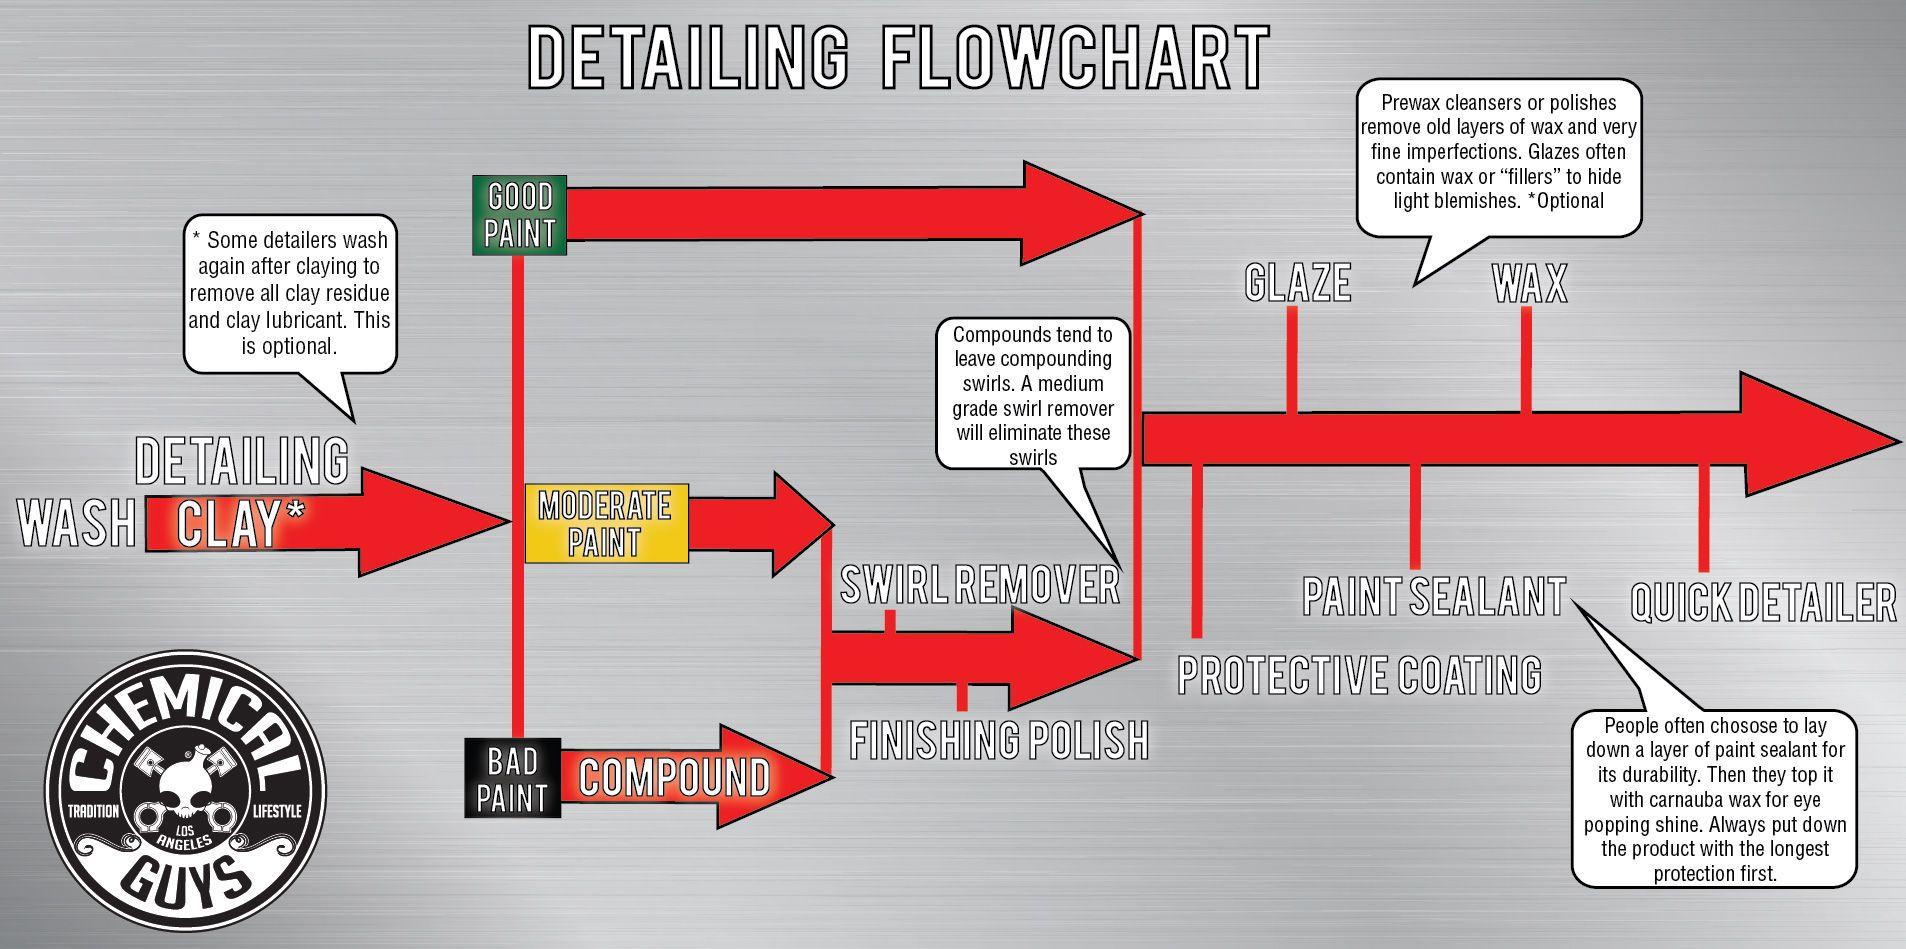 Auto detailing 101 chemical guys flowchart for proper car